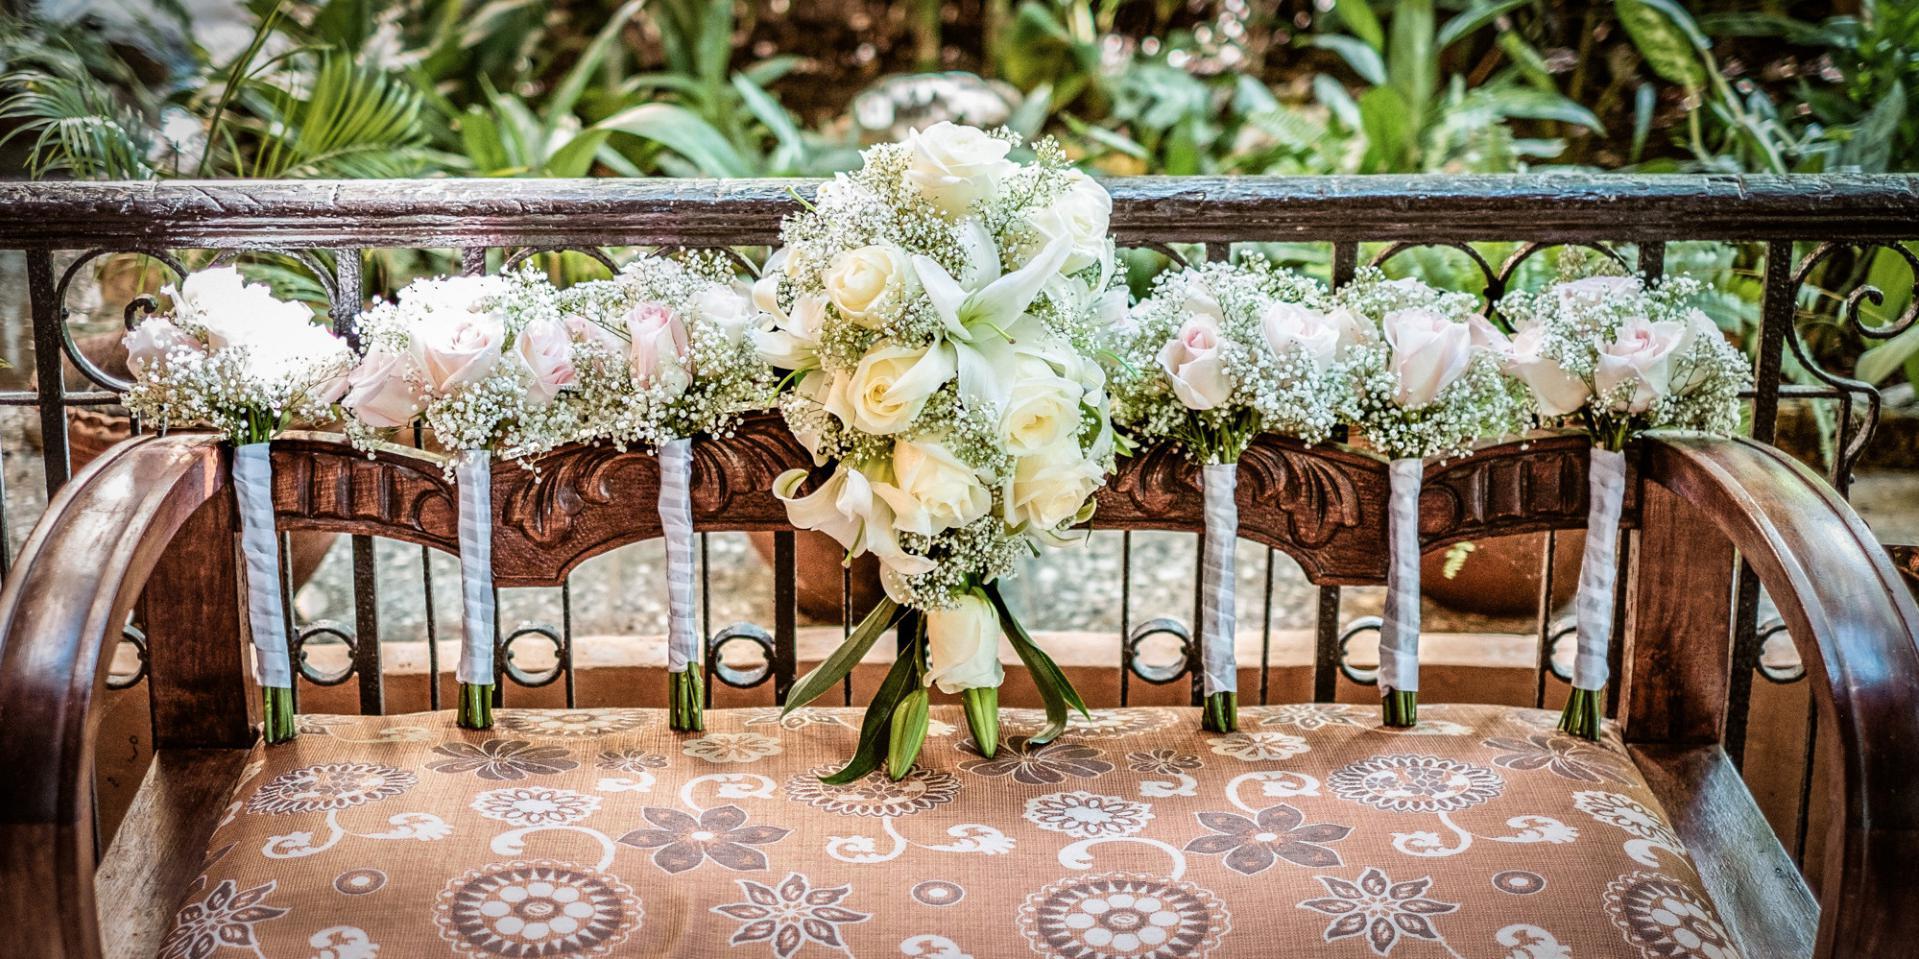 bodas-sin-clasificar-sin-tema-cuba-27501.jpg